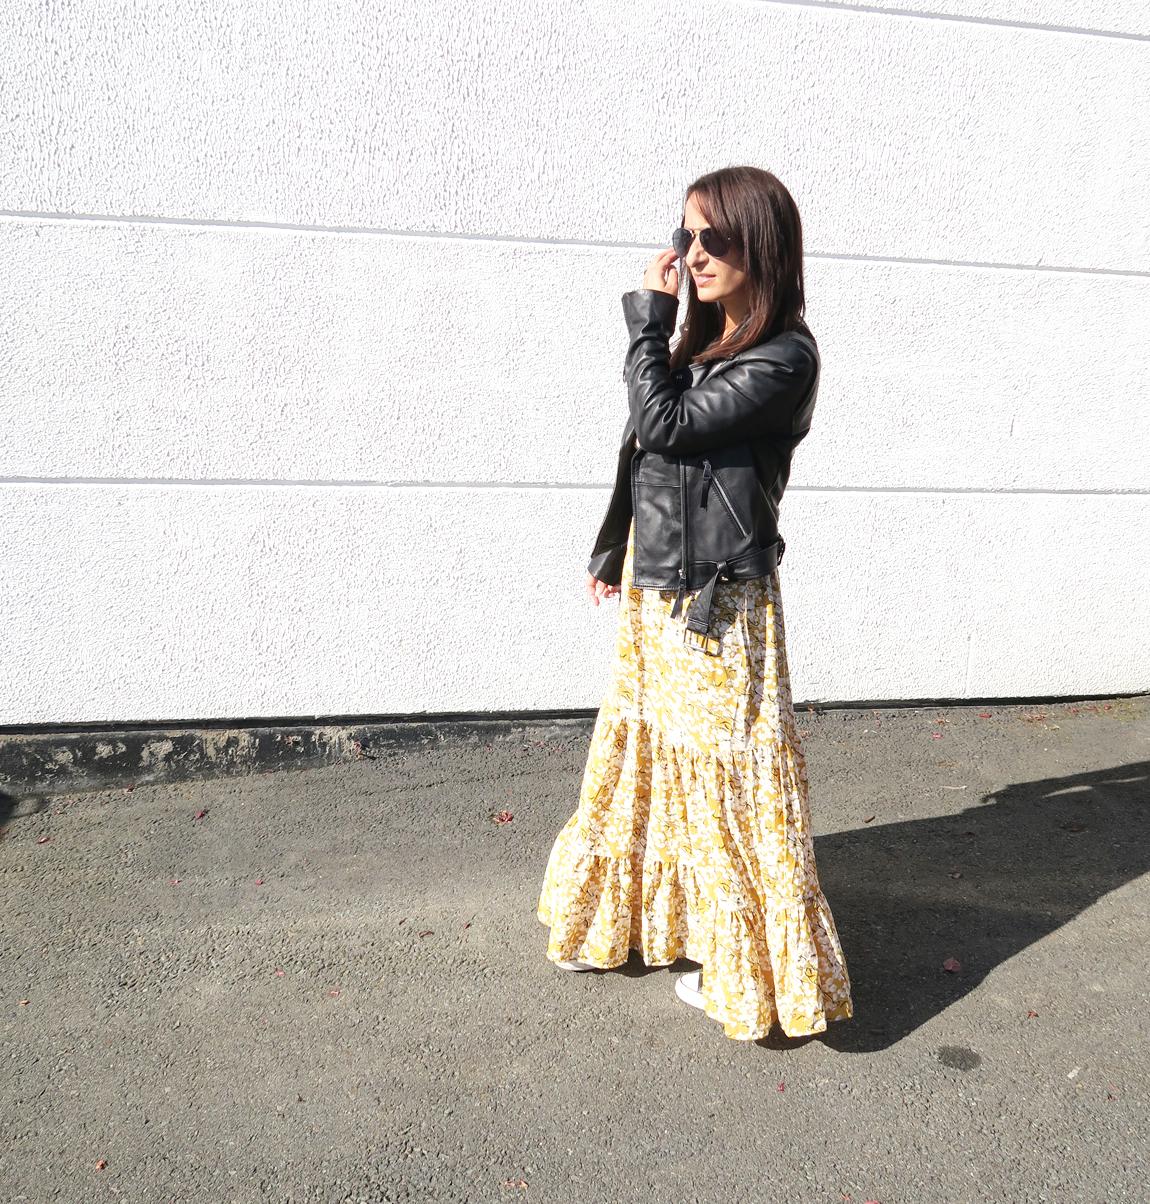 dressfo-kleid-modeblogger-fashionblogger-blogger-style-fashion-modesalat-streetstyle-1